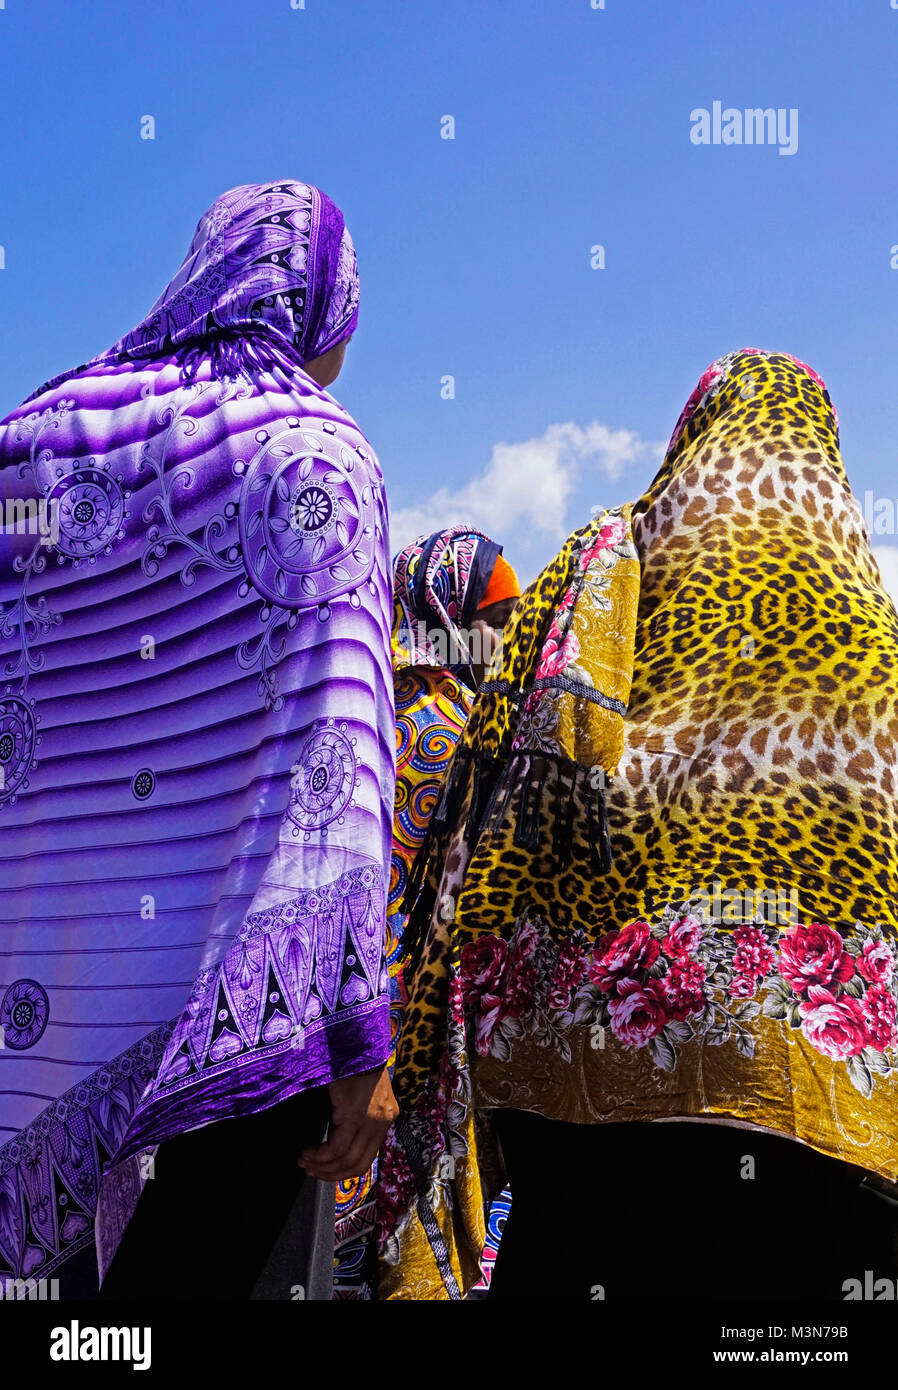 Colorful hijabs worn by three Muslim women in Zanzibar's Stone Town. - Stock Image